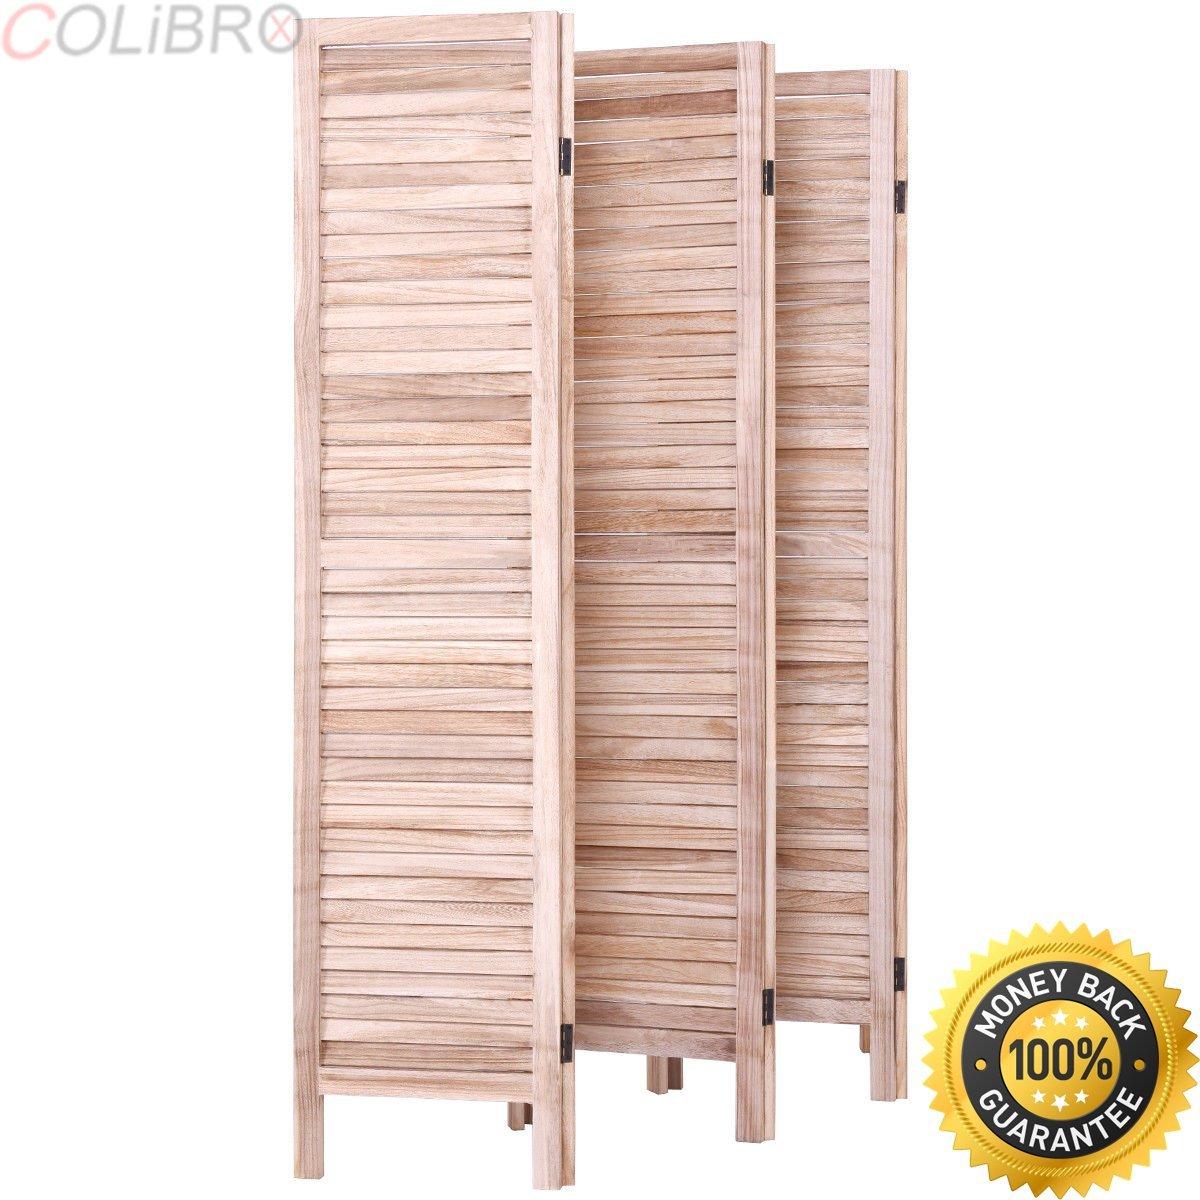 "COLIBROX--67"" High 6 Panel Room Divider Furniture Classic Venetian Wooden Slat Home Brown. venetian room divider.wood room dividers screens.best wooden room dividers amazon.cubicle room divider."